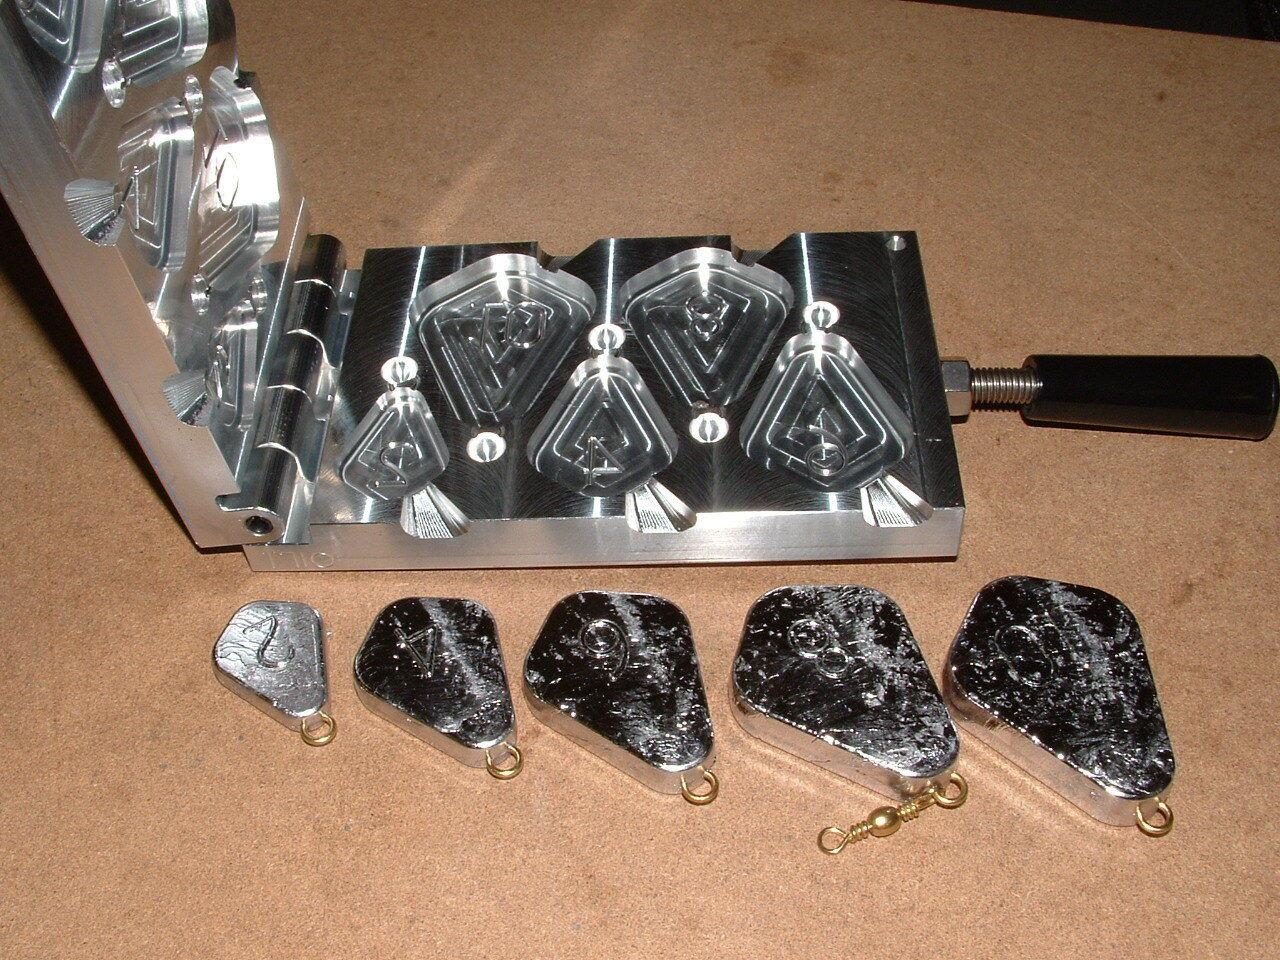 Saltwater No Roll Sinker mold 2,4,6,8,10oz CNC Aluminum Freshwater Catfish